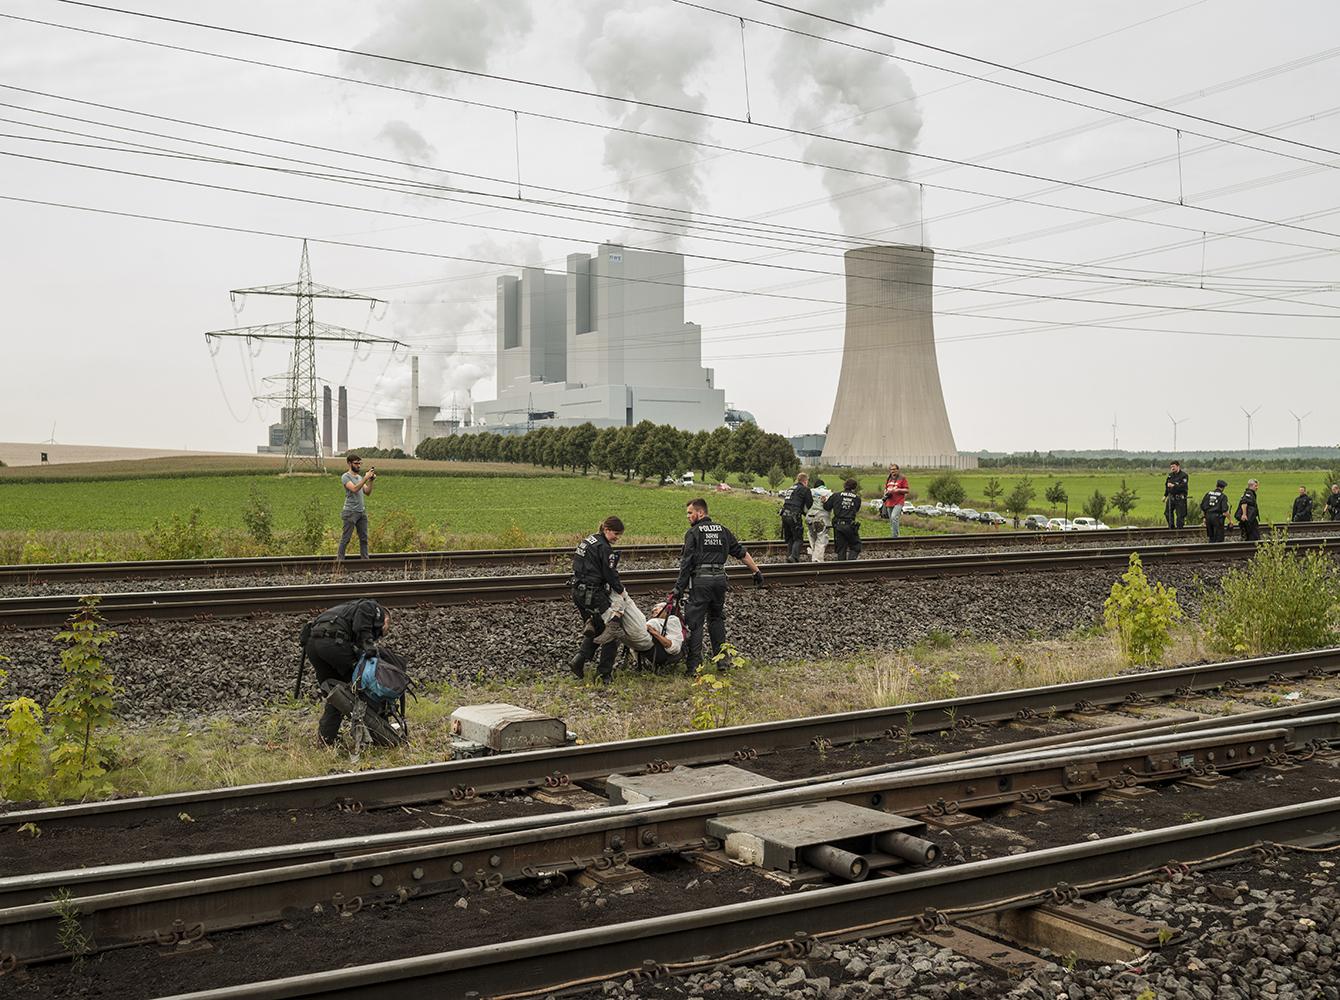 Kohlebahn Blokade am Kraftwerk Neurath